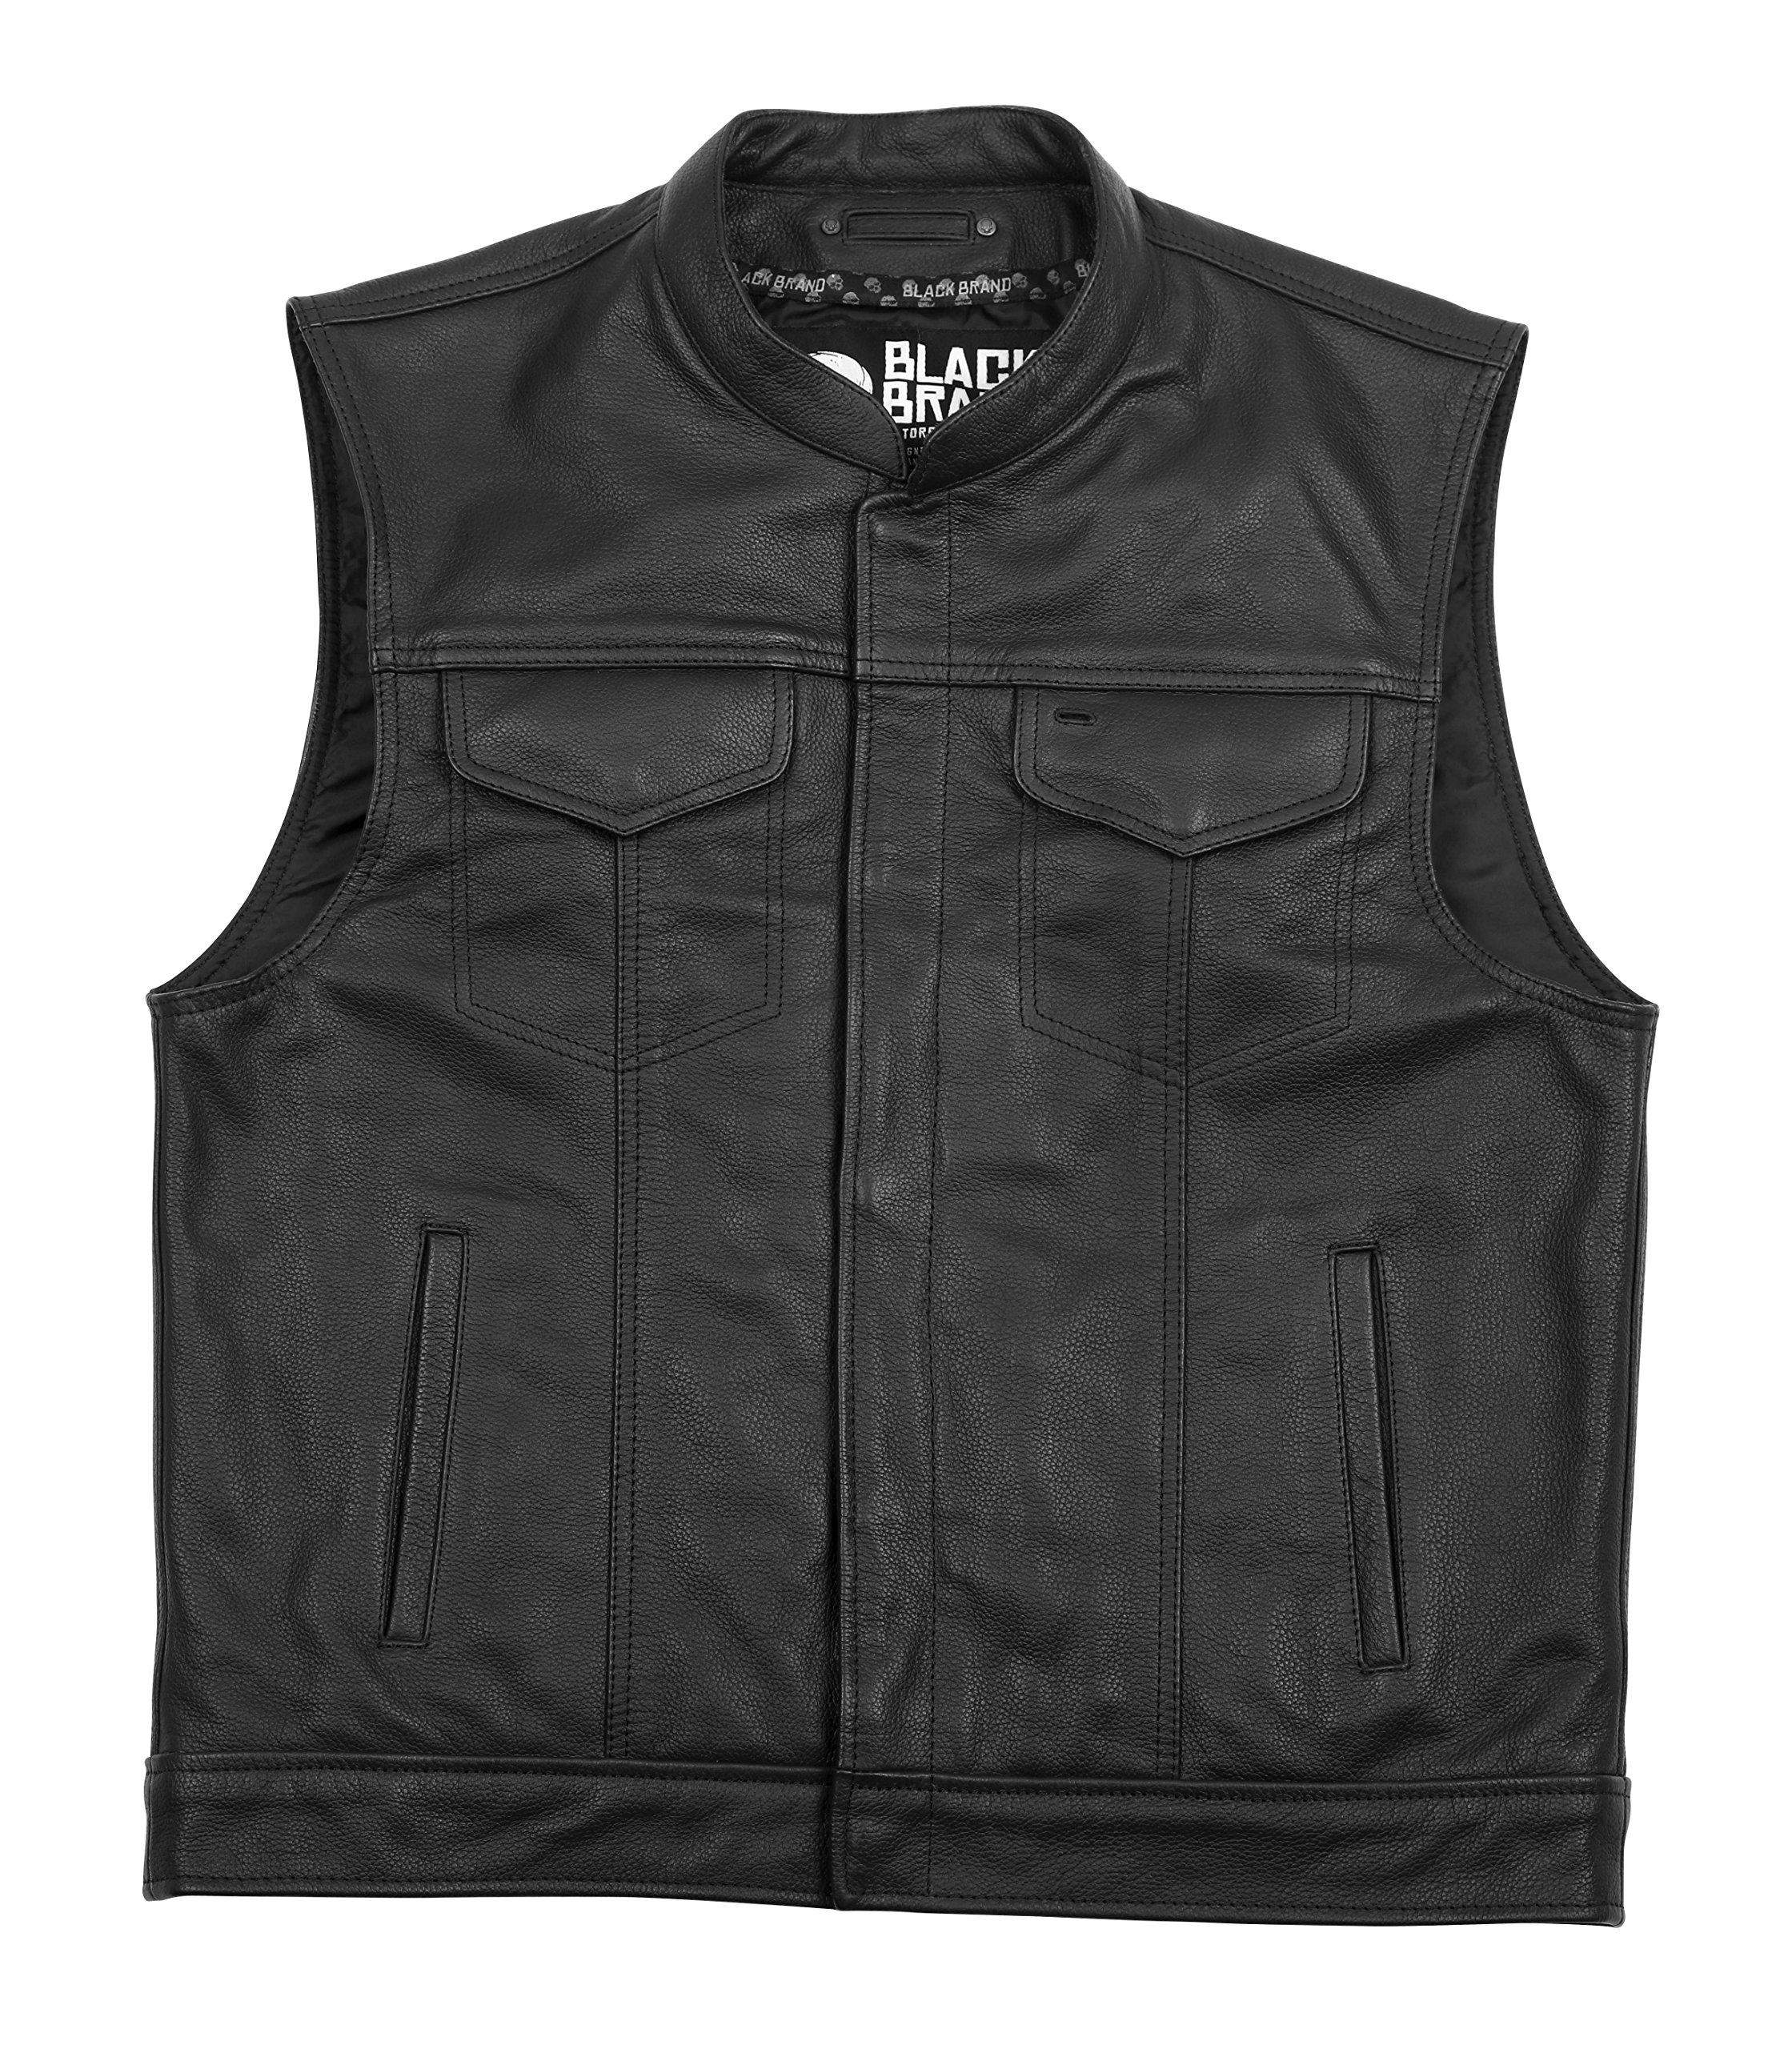 Black Brand Men's Leather Club Motorcycle Vest (Black, 4X-Large)